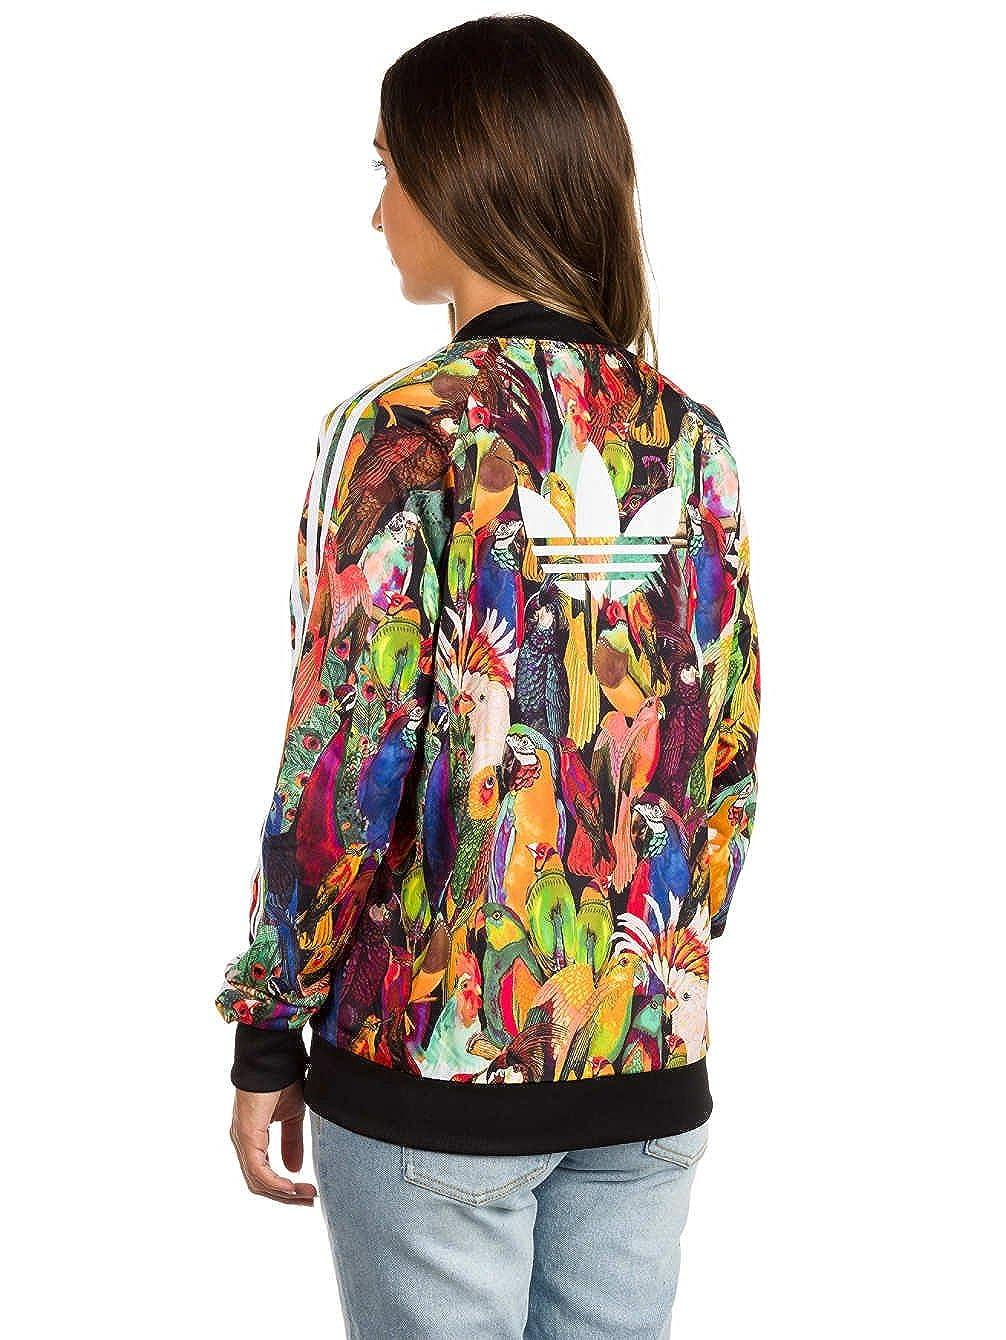 adidas Passaredo TT W veste de survêtement multicolor FR 36